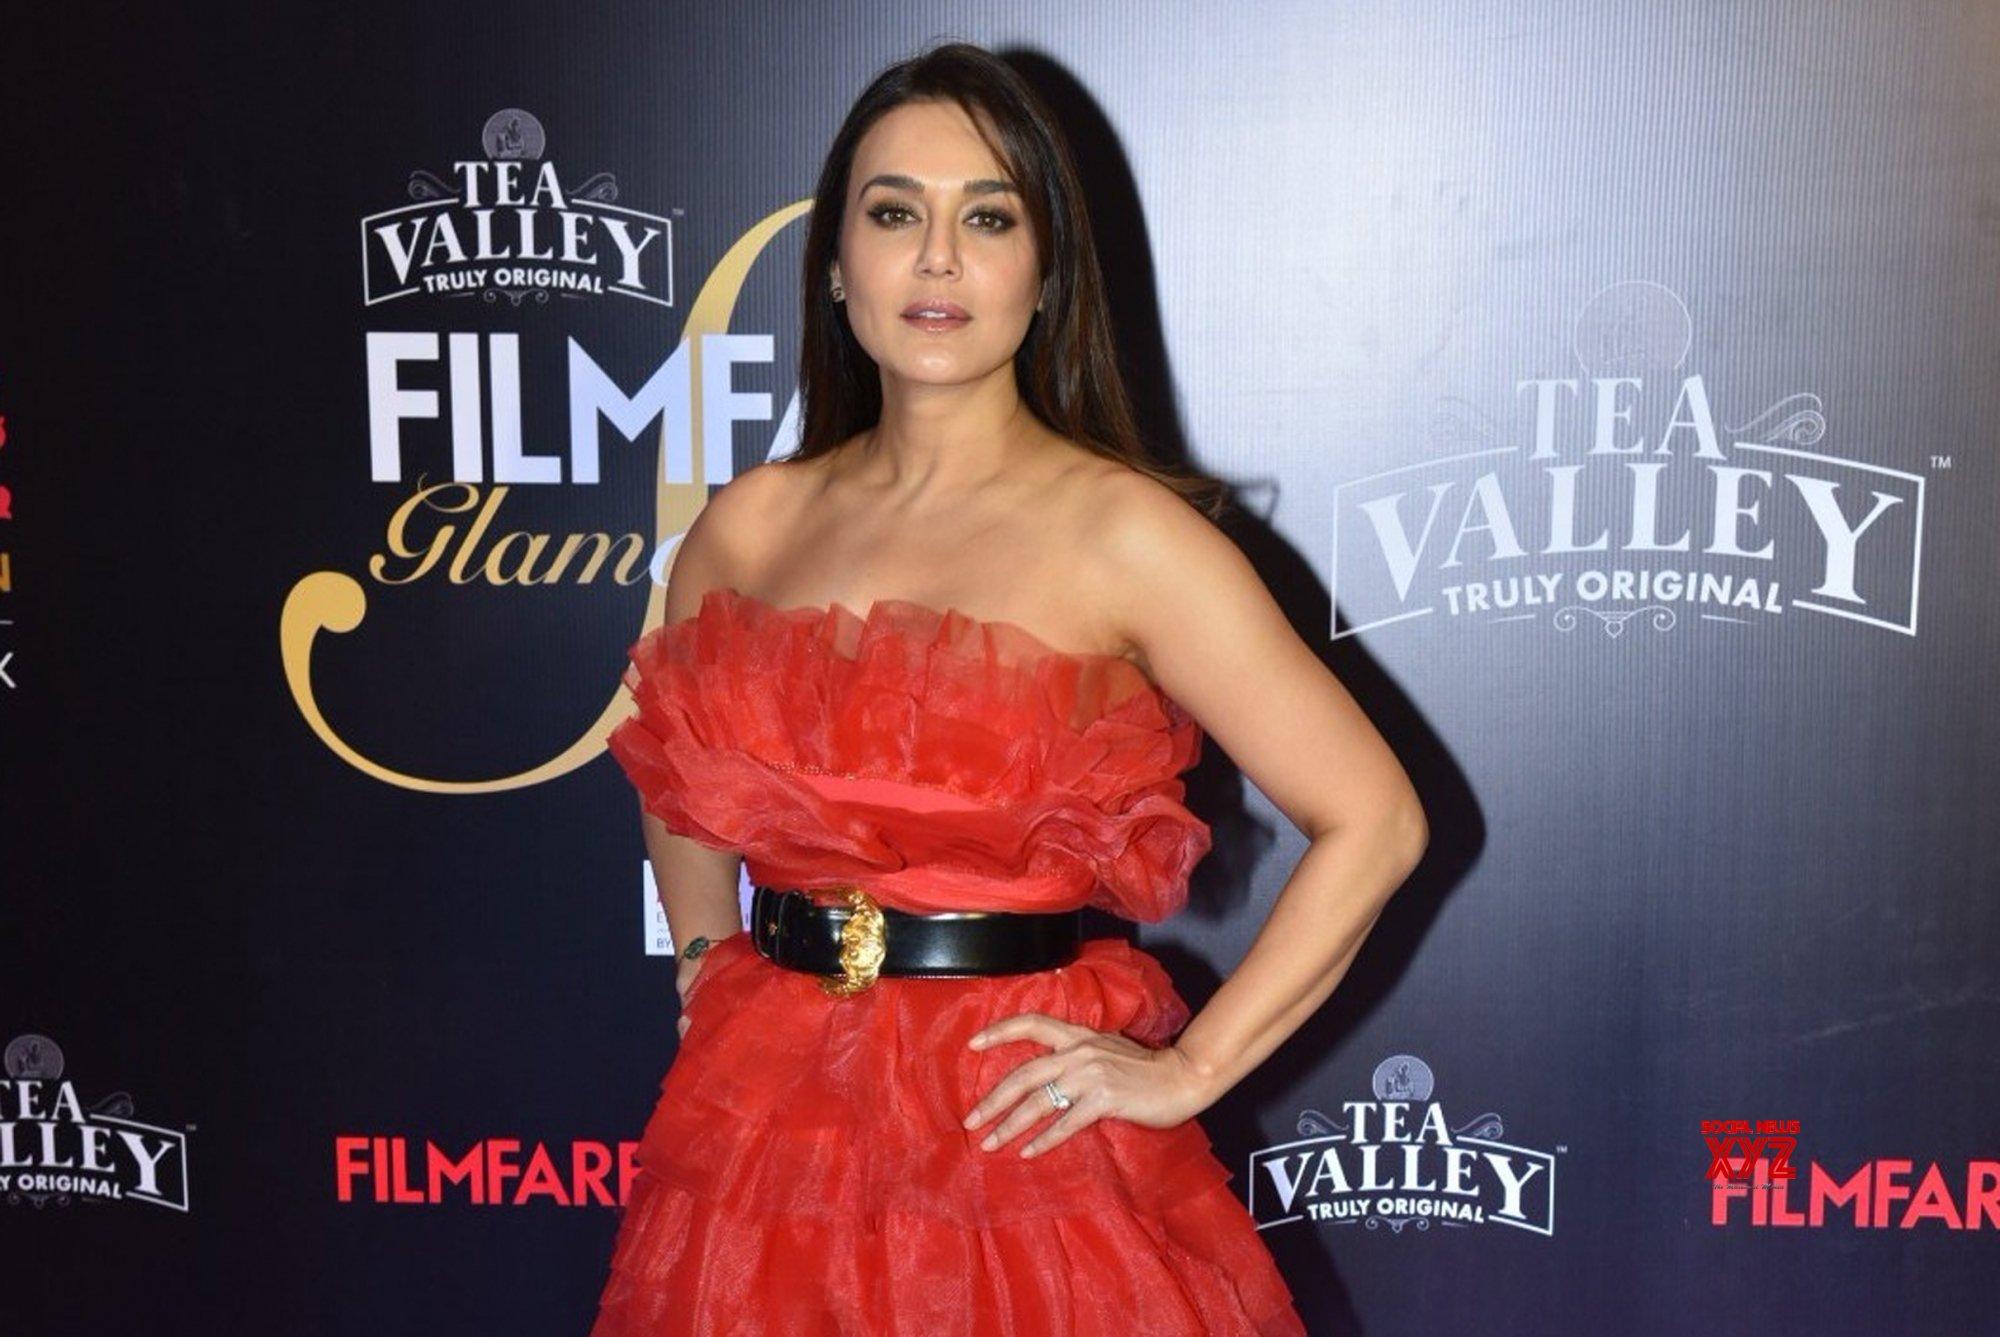 Mumbai: Filmfare Glamour And Style Awards 2019 - Preity Zinta #Gallery